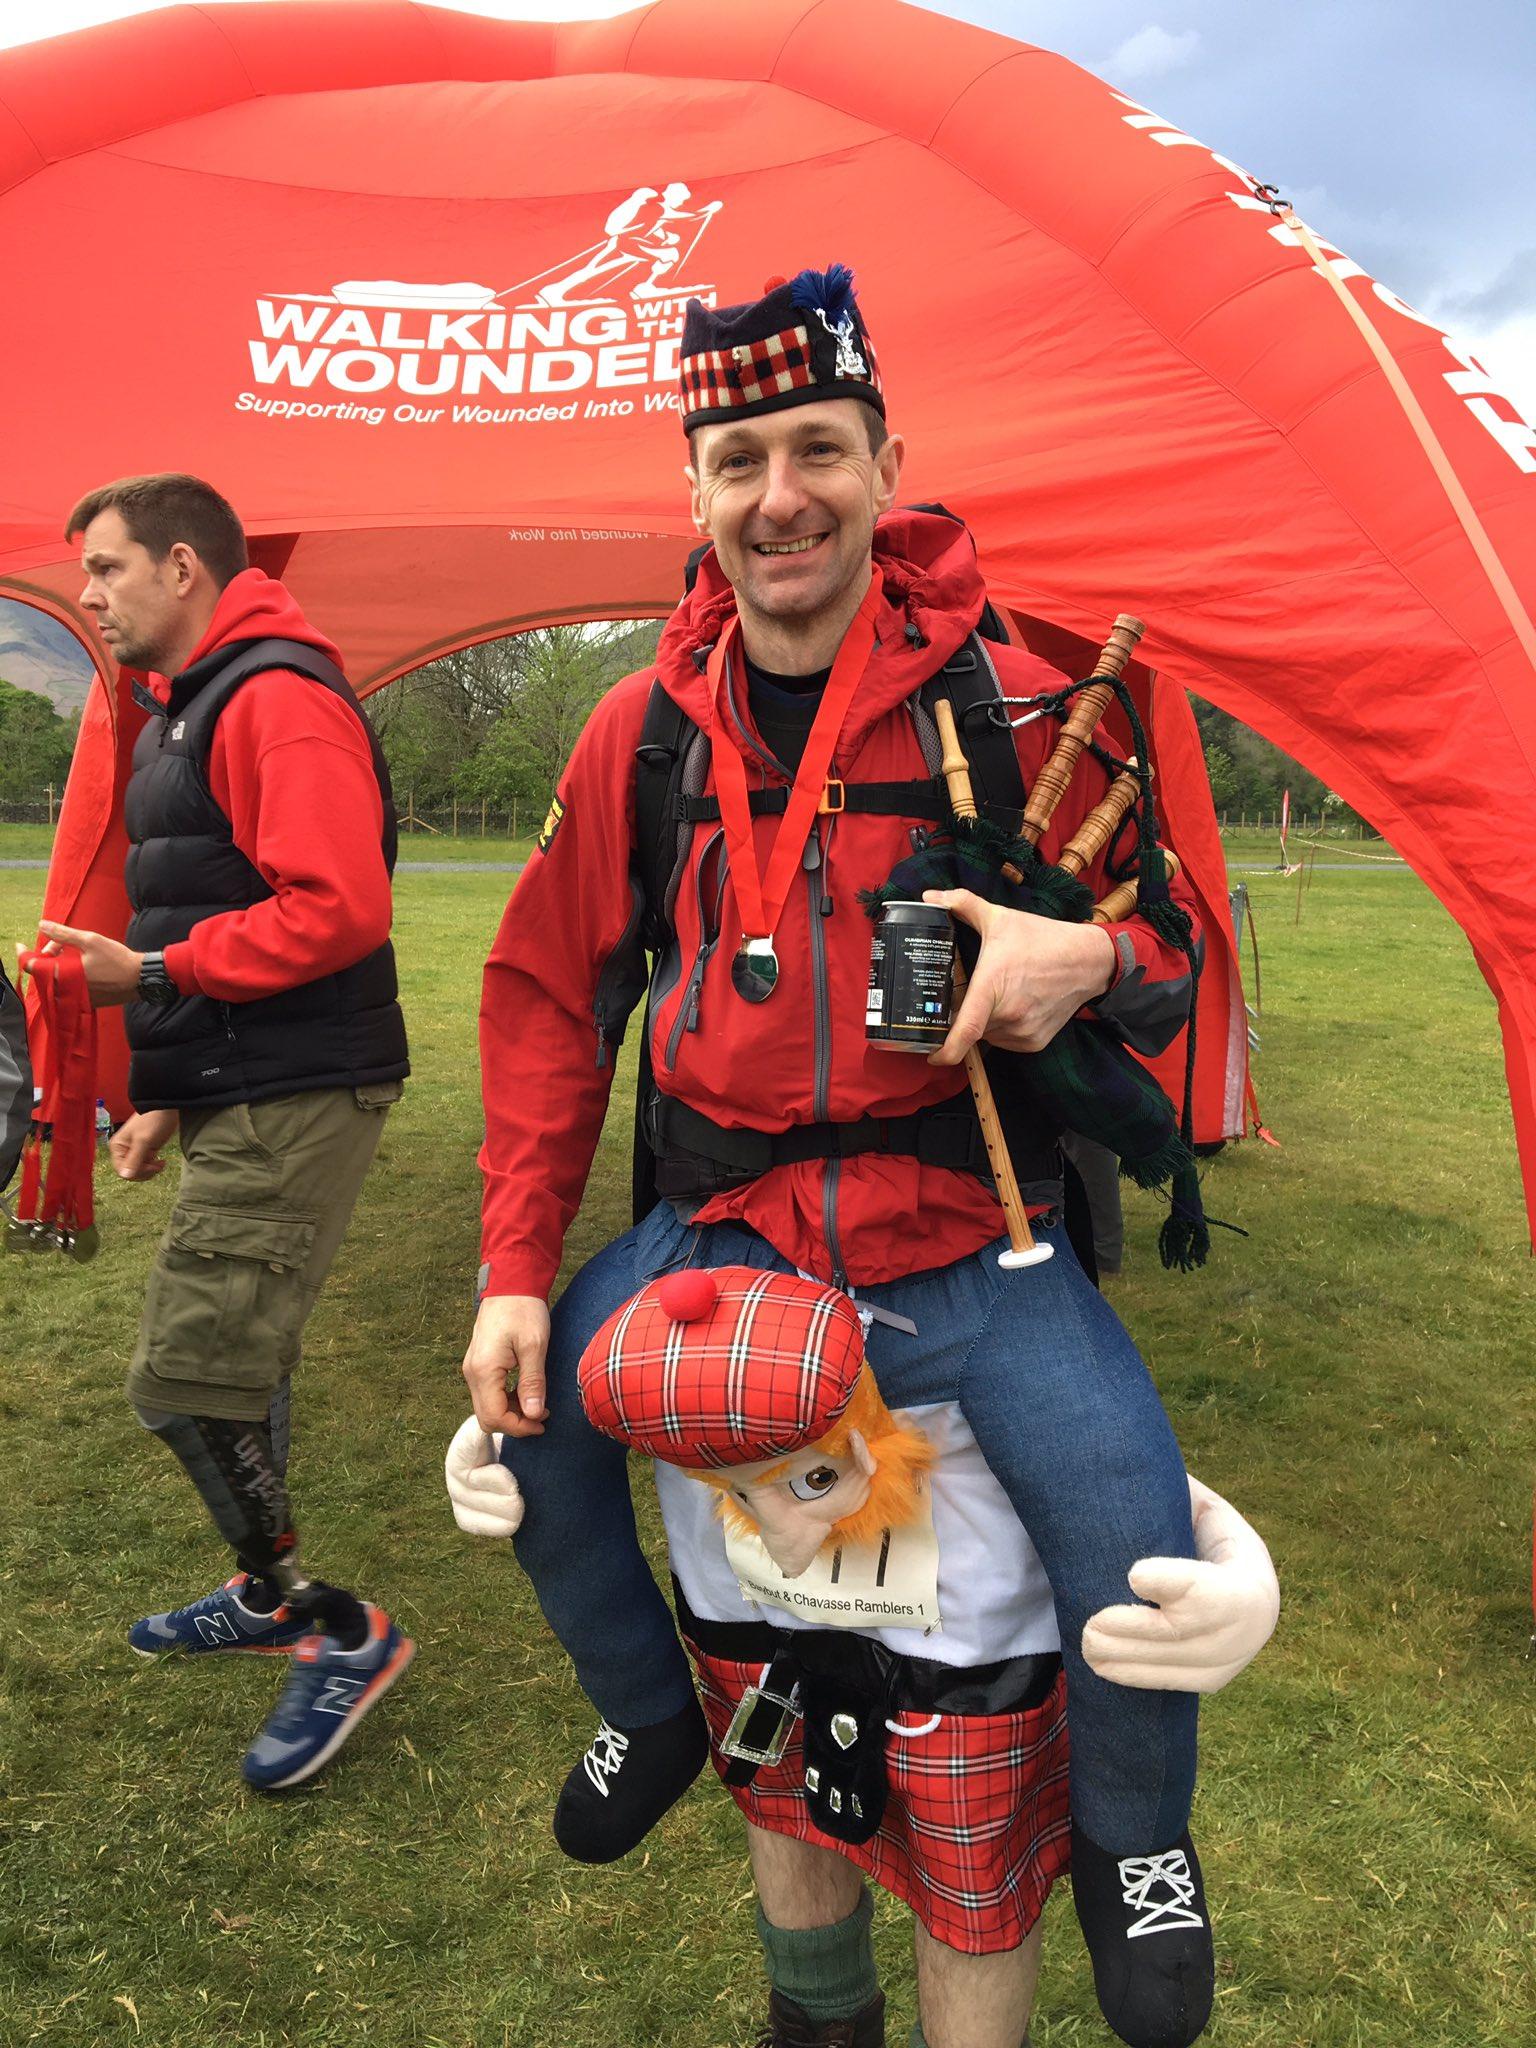 Great Scot he did well!@supportthewalk #CumbrianChallenge https://t.co/BlDaS7e4ql